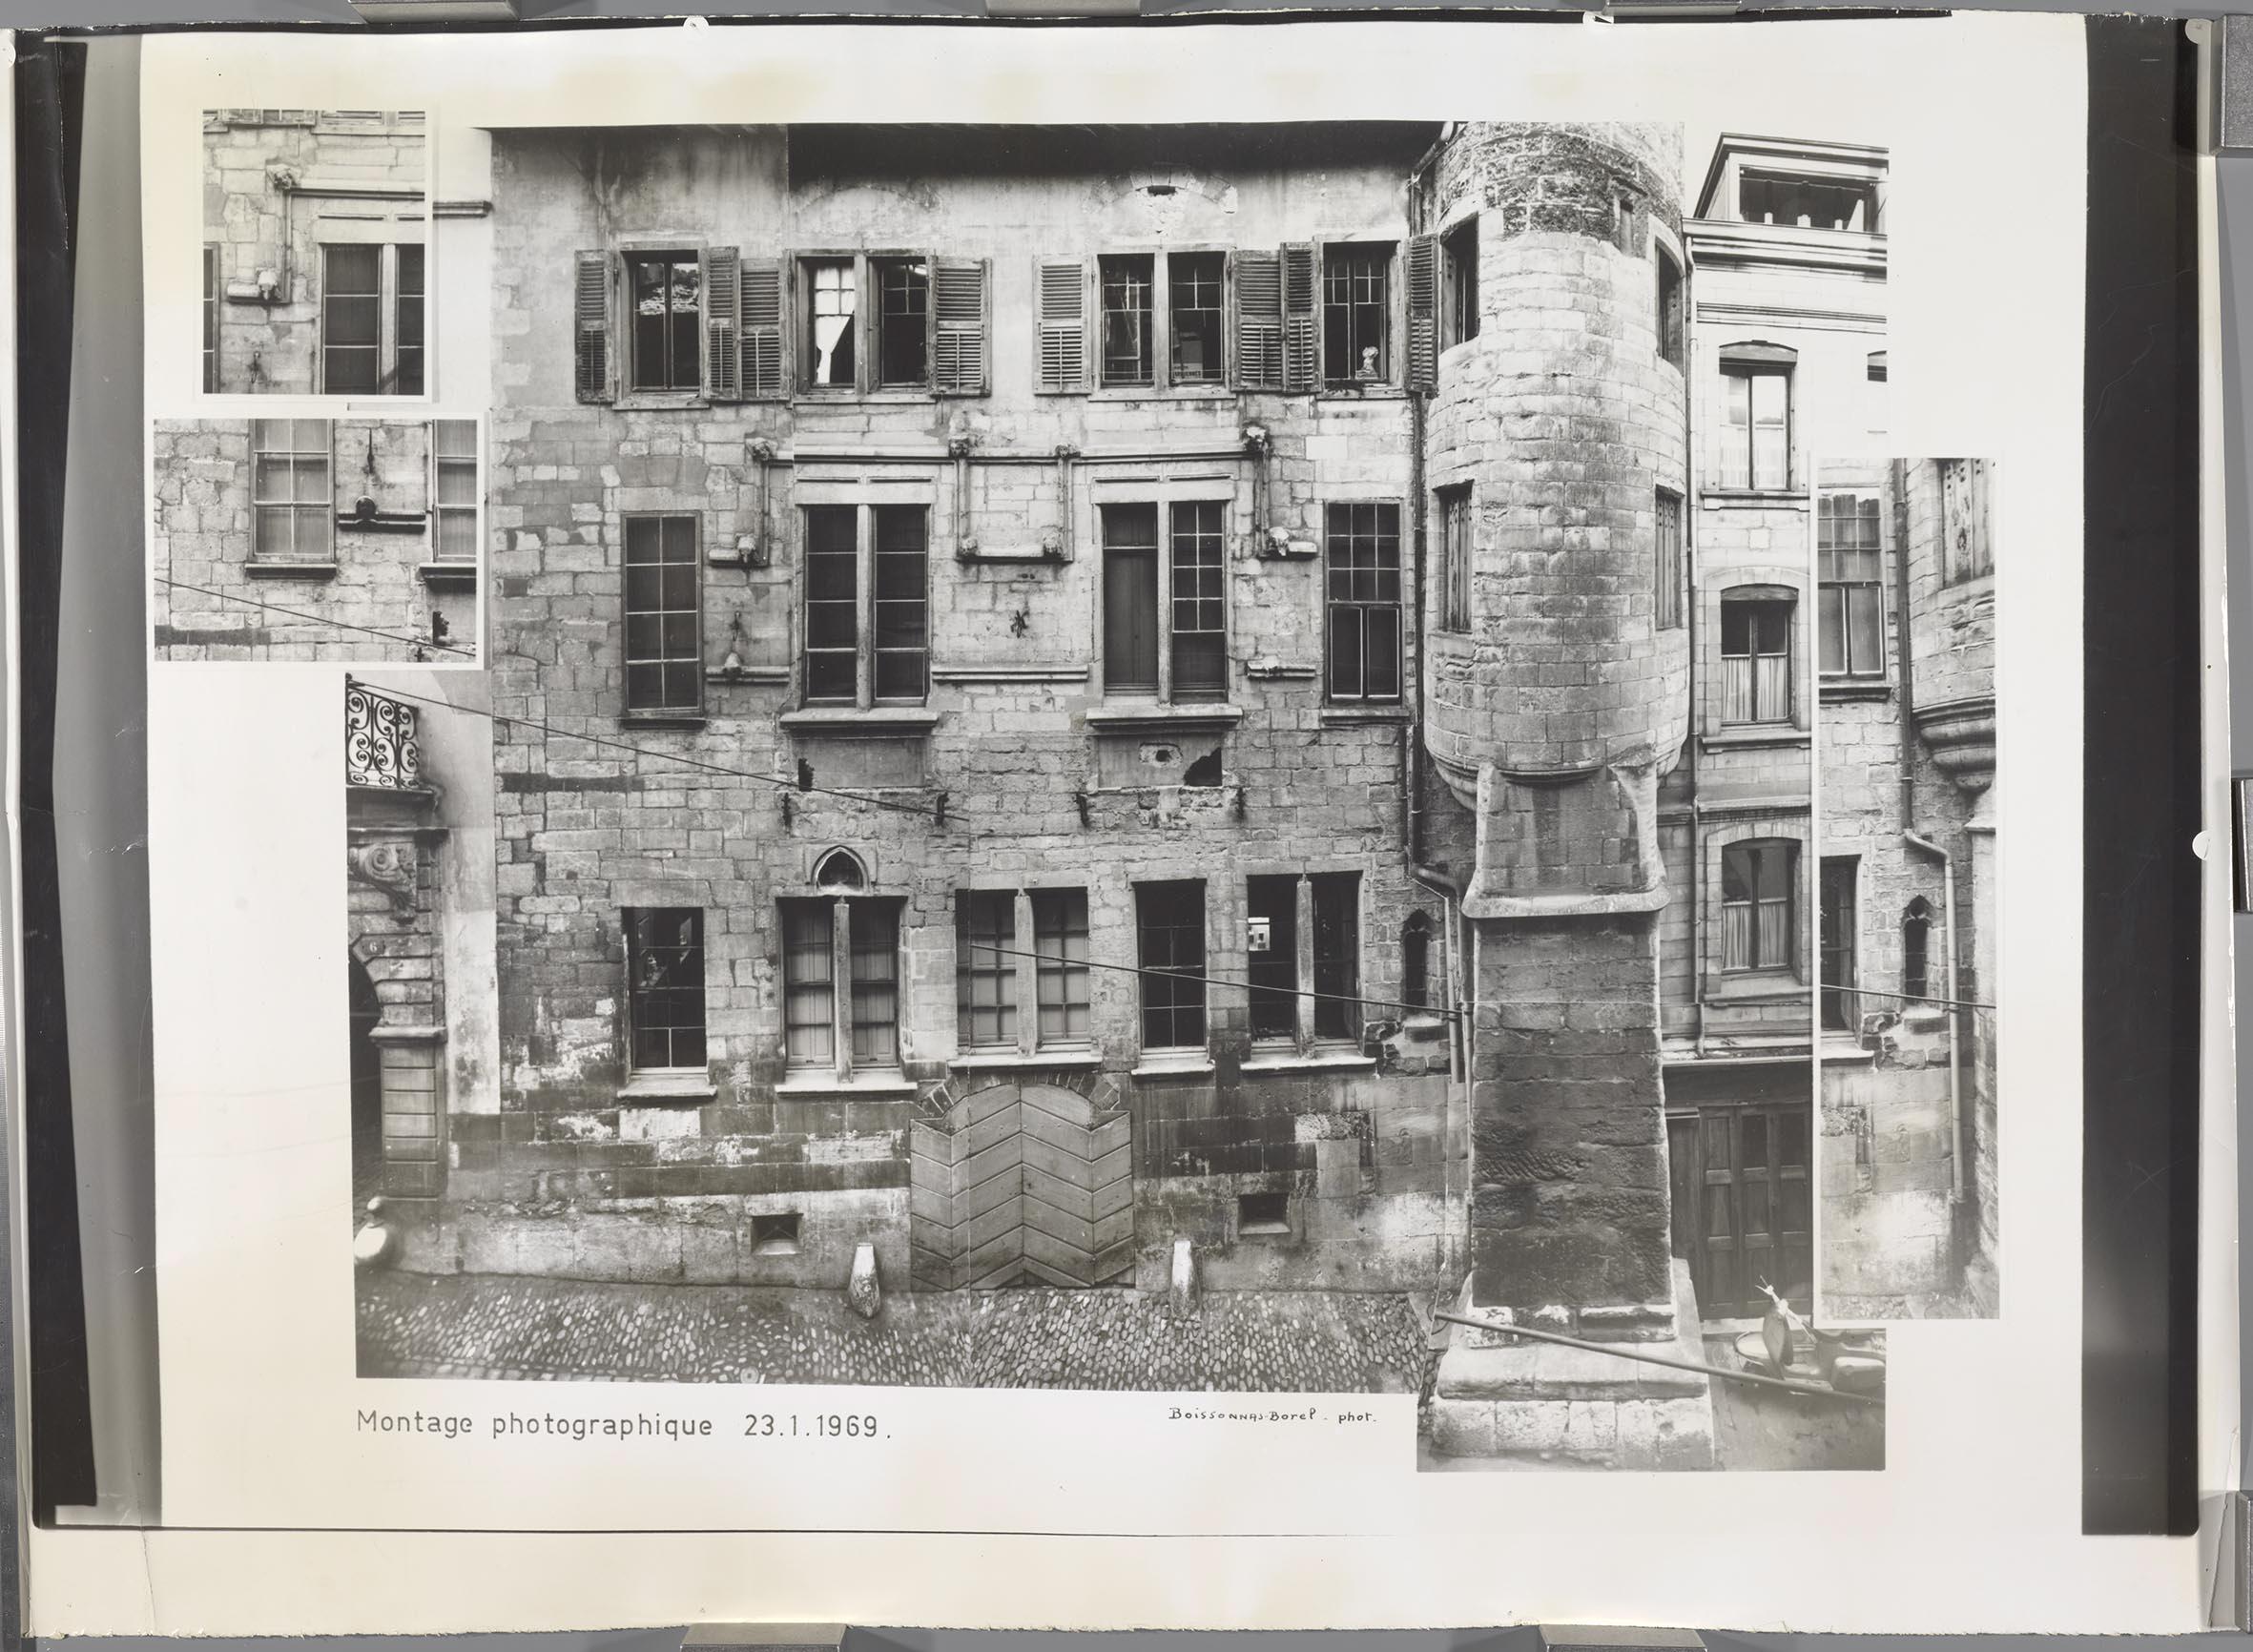 Genève, maison Tavel